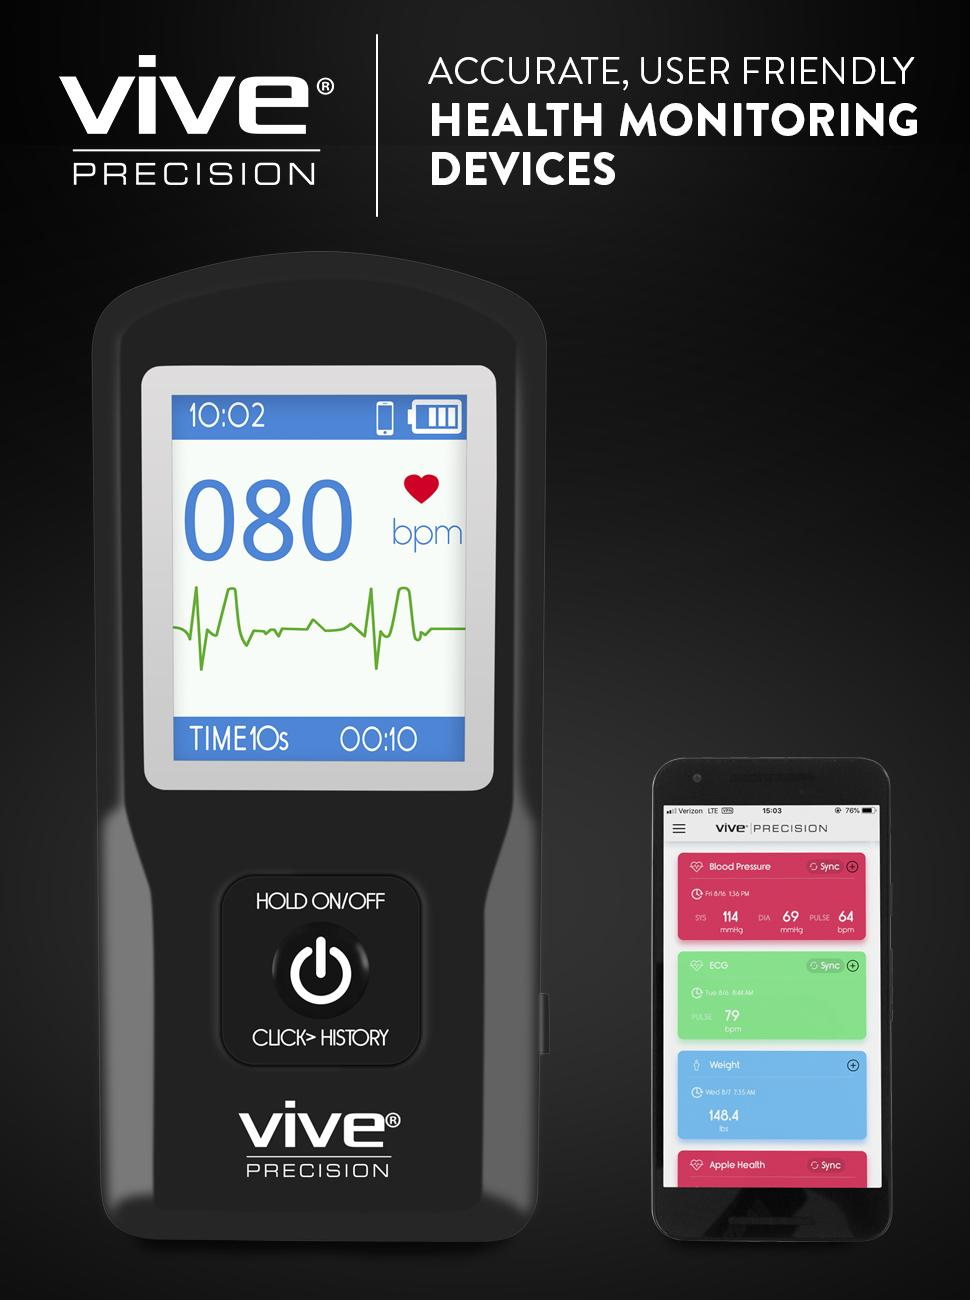 App Included Vive Precision EKG Monitor Smartphone Compatible - Portable Pocket ECG Device Wireless Electrocardiogram Test Made Easy Heart Rate Tracking Sensor Detects Irregular Cardiac Rhythm